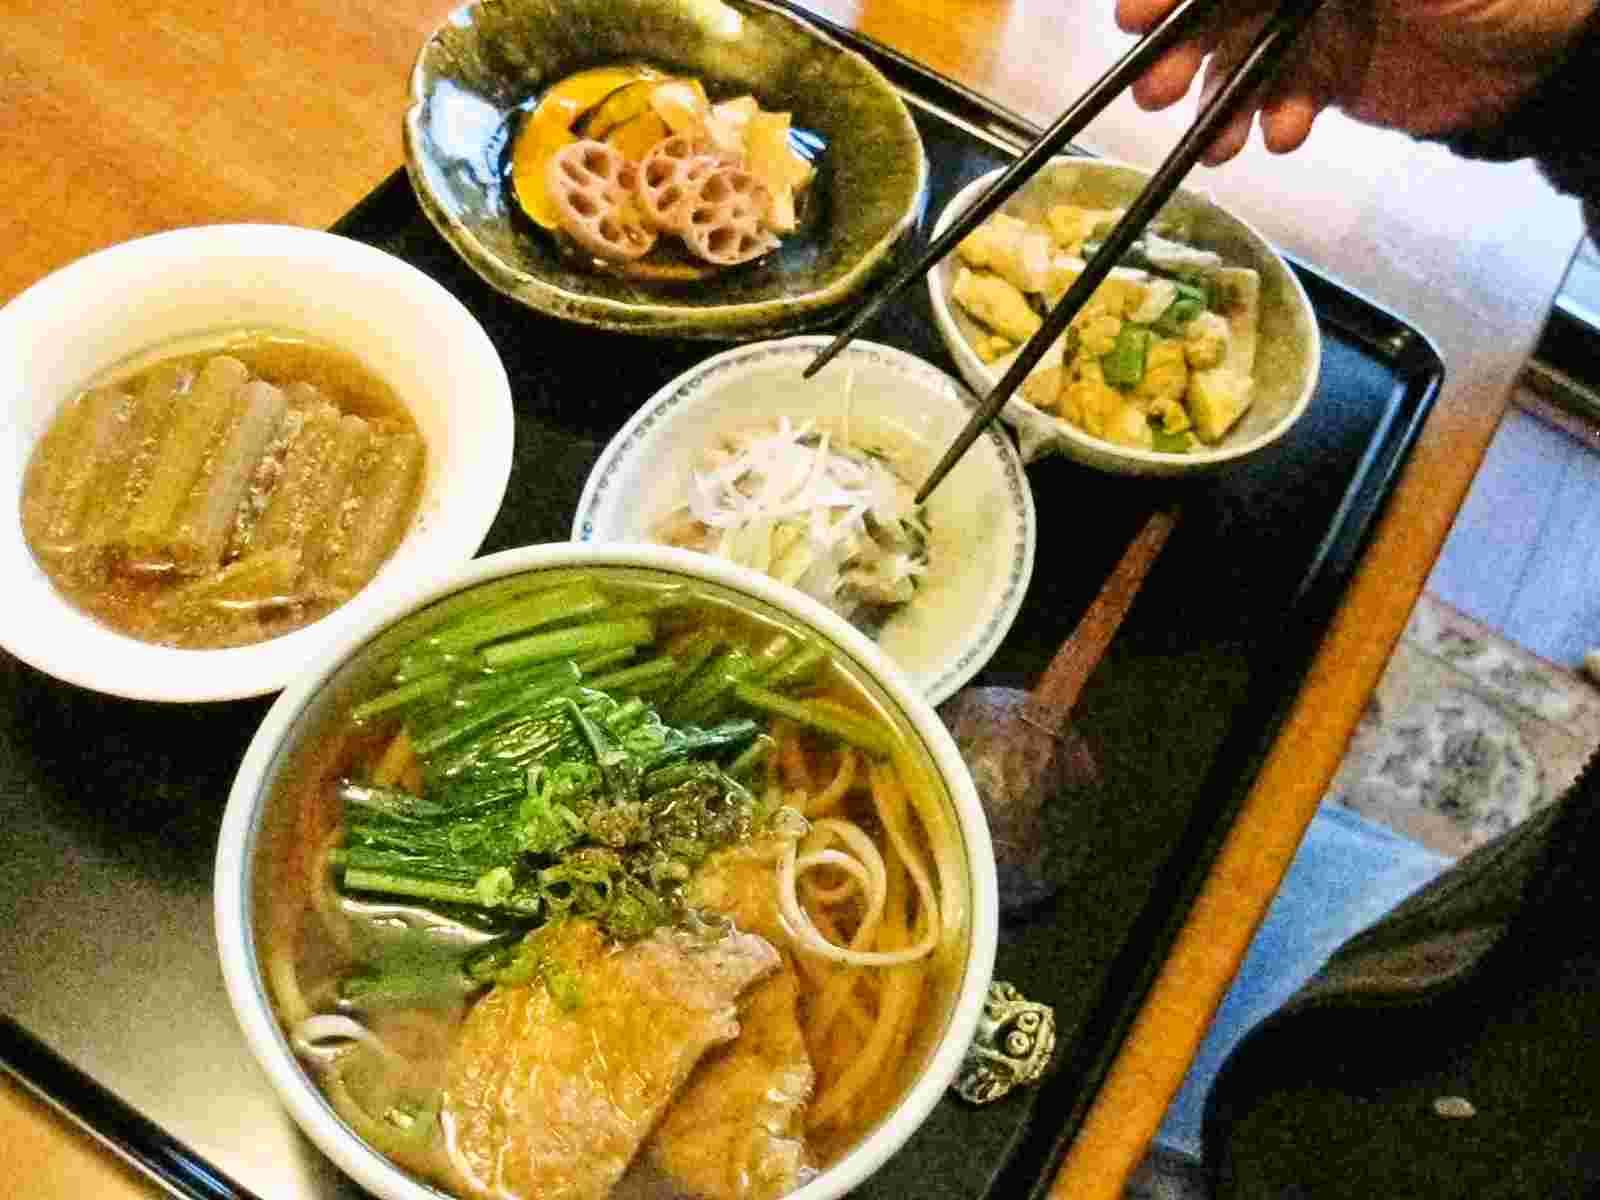 Recipes for tom japanese food 101 japanese food 101 forumfinder Choice Image